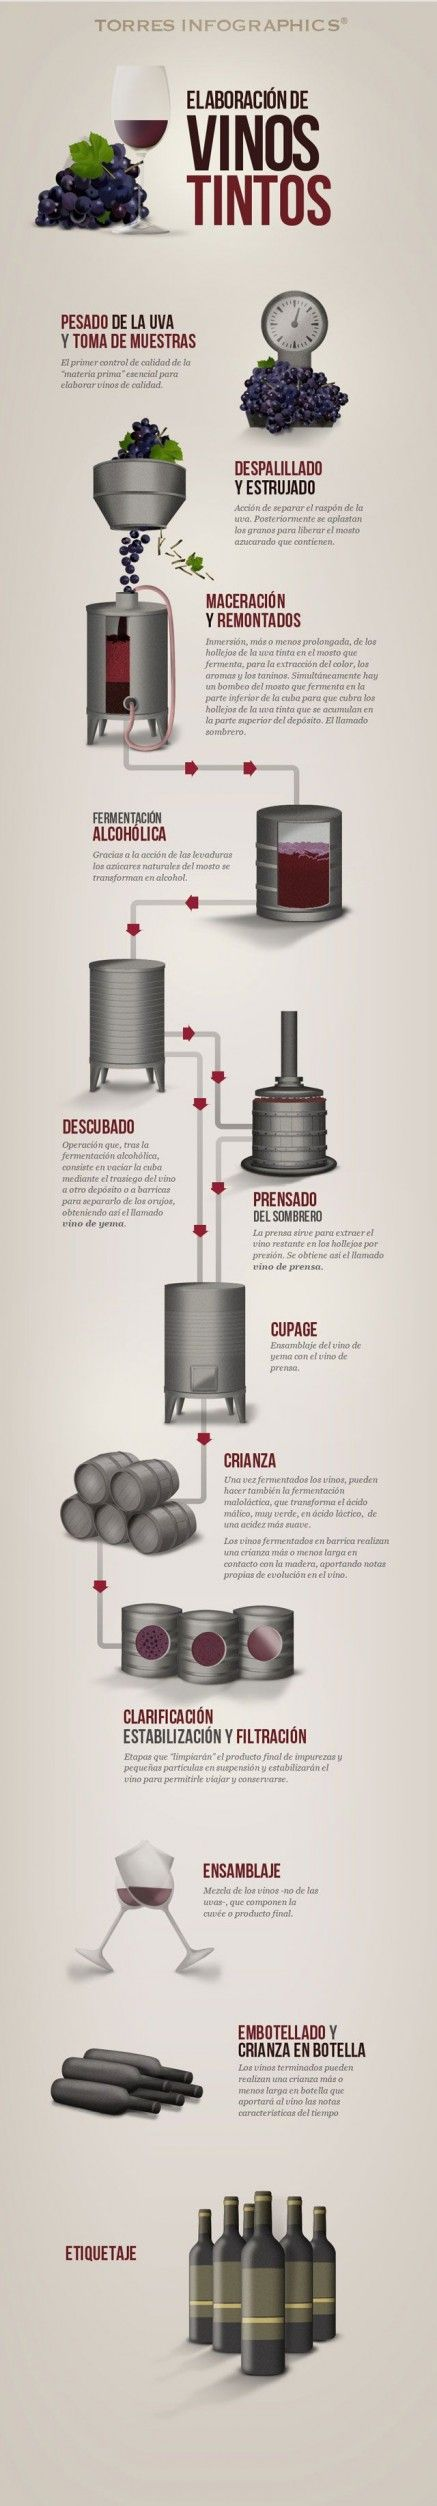 Elaboración de vinos tintos